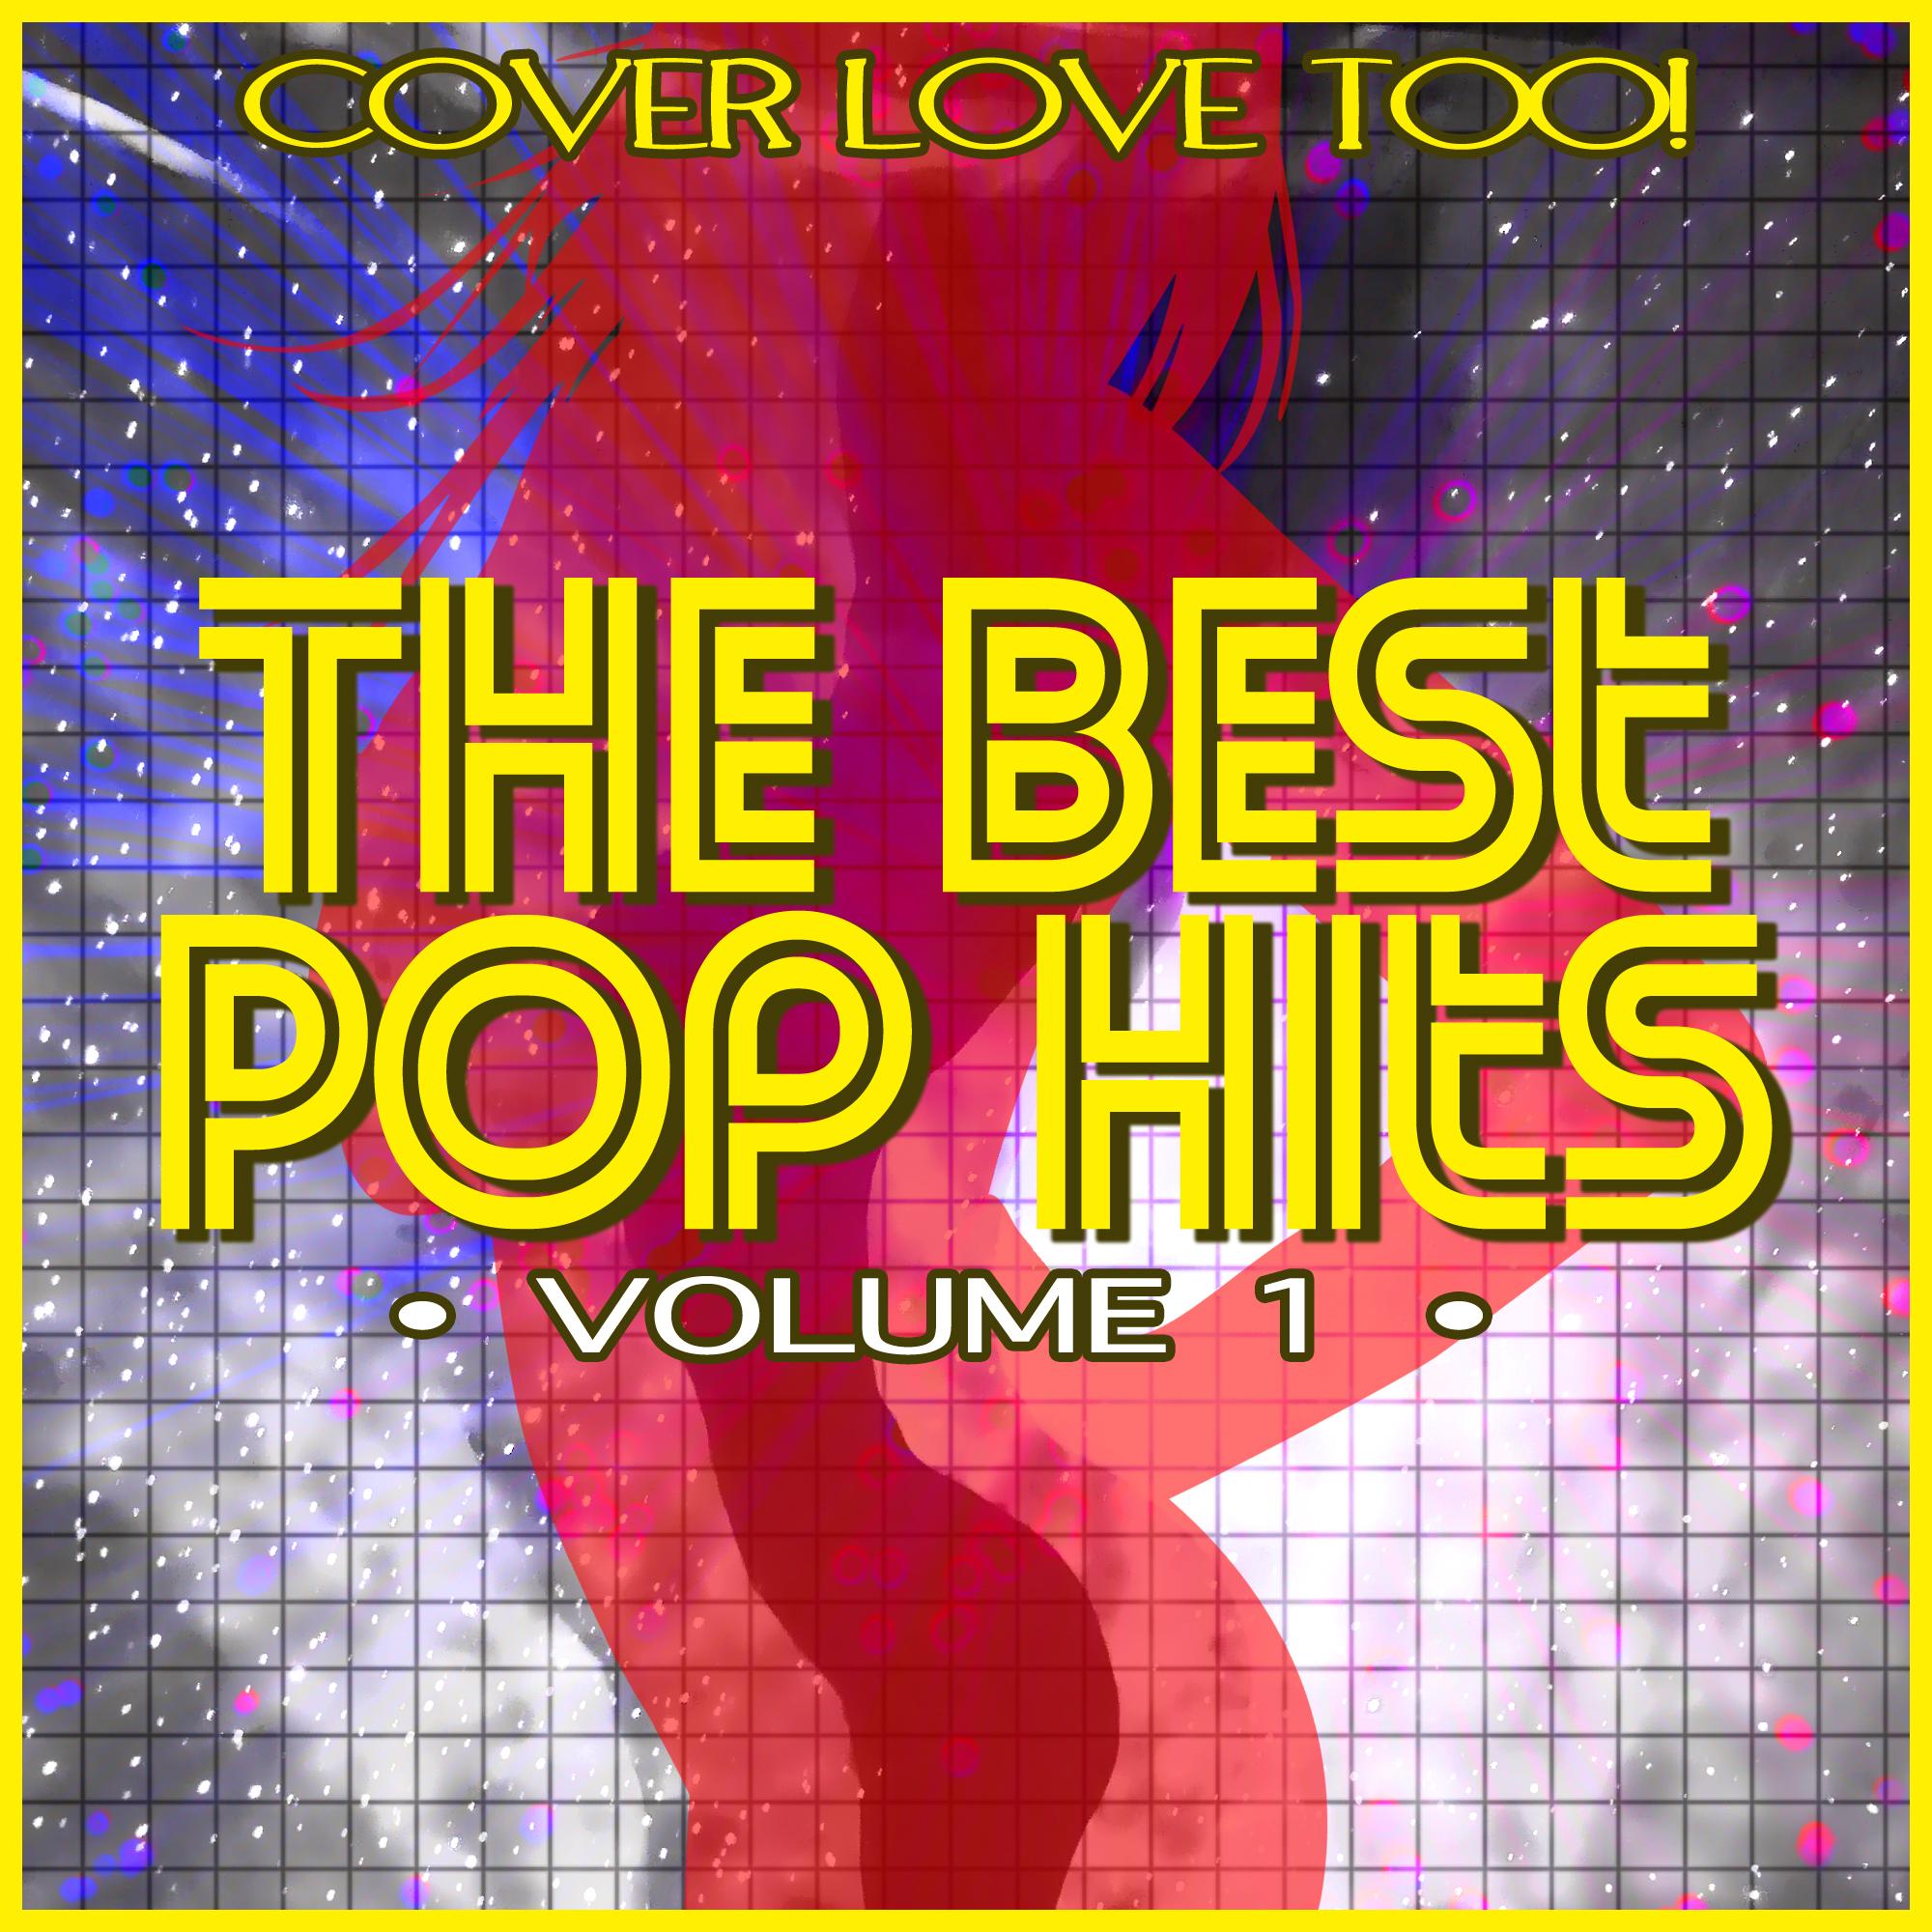 The Best Pop Hits Volume 1.